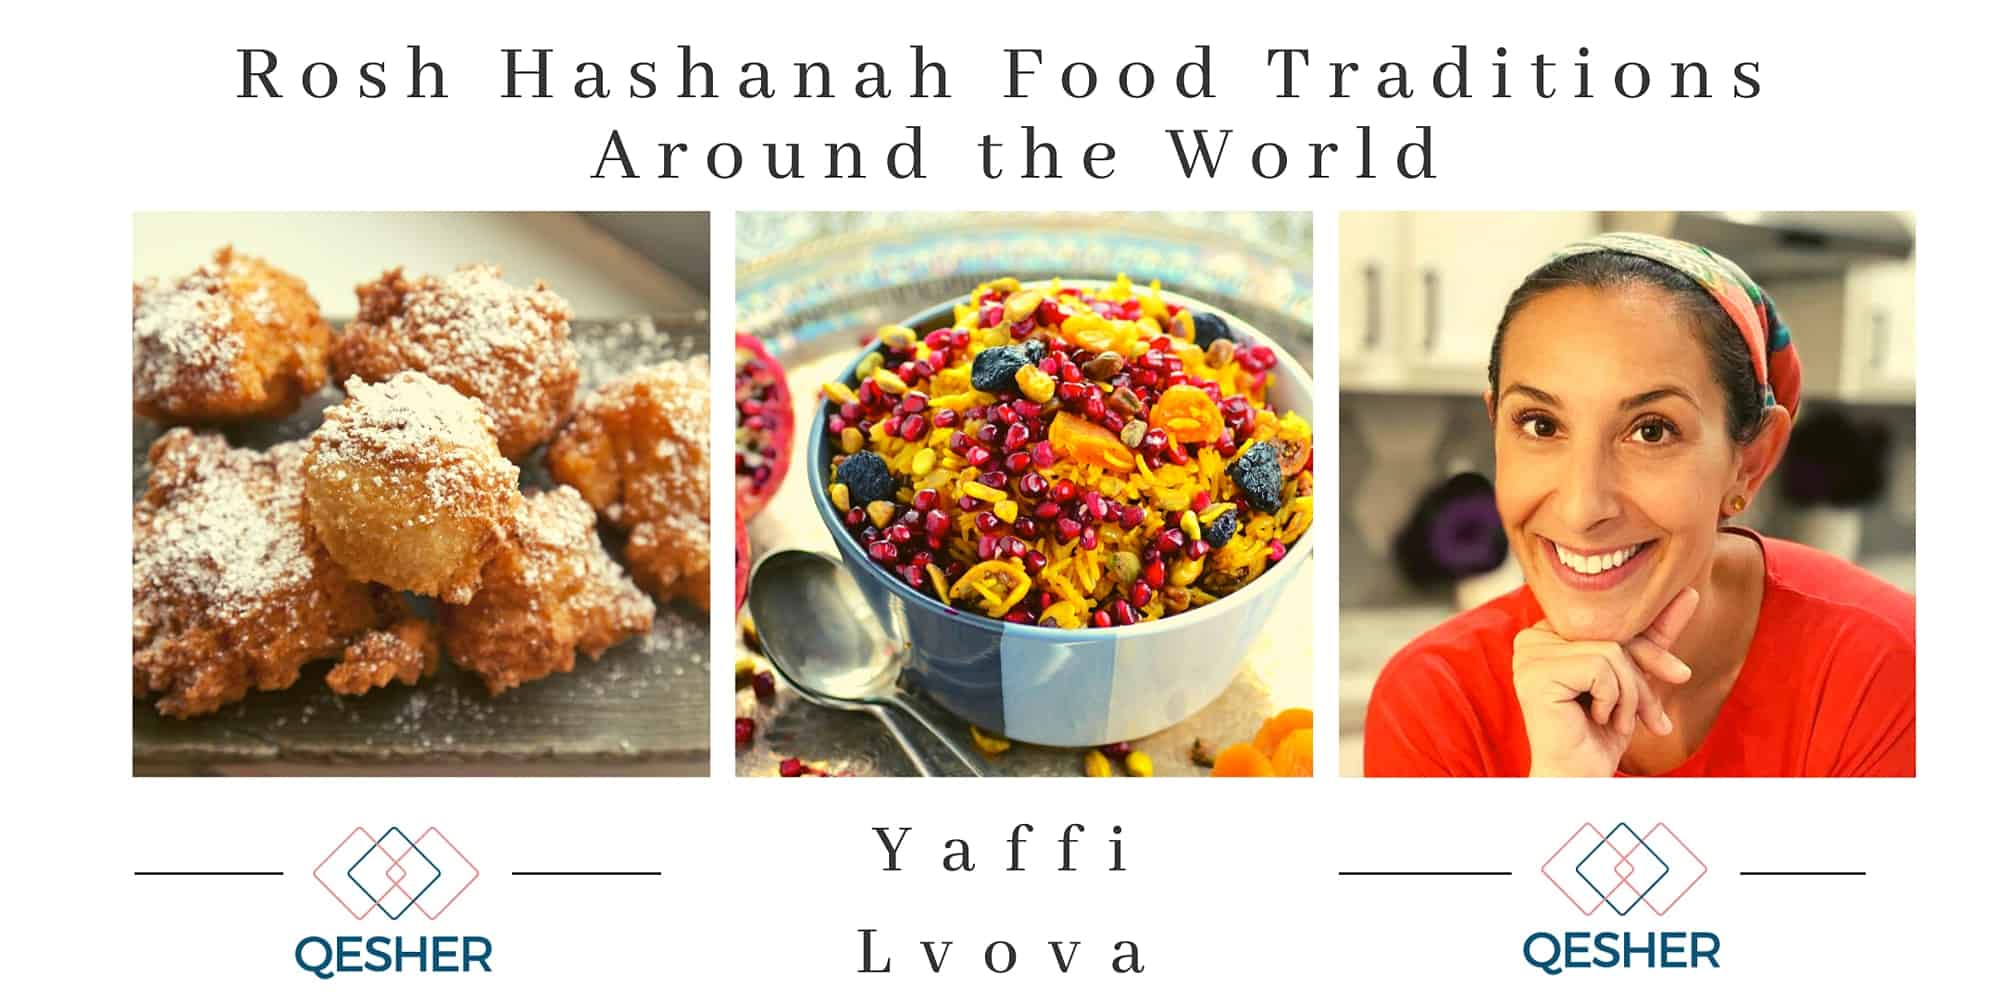 Rosh Hashanah Food Traditions Around the World